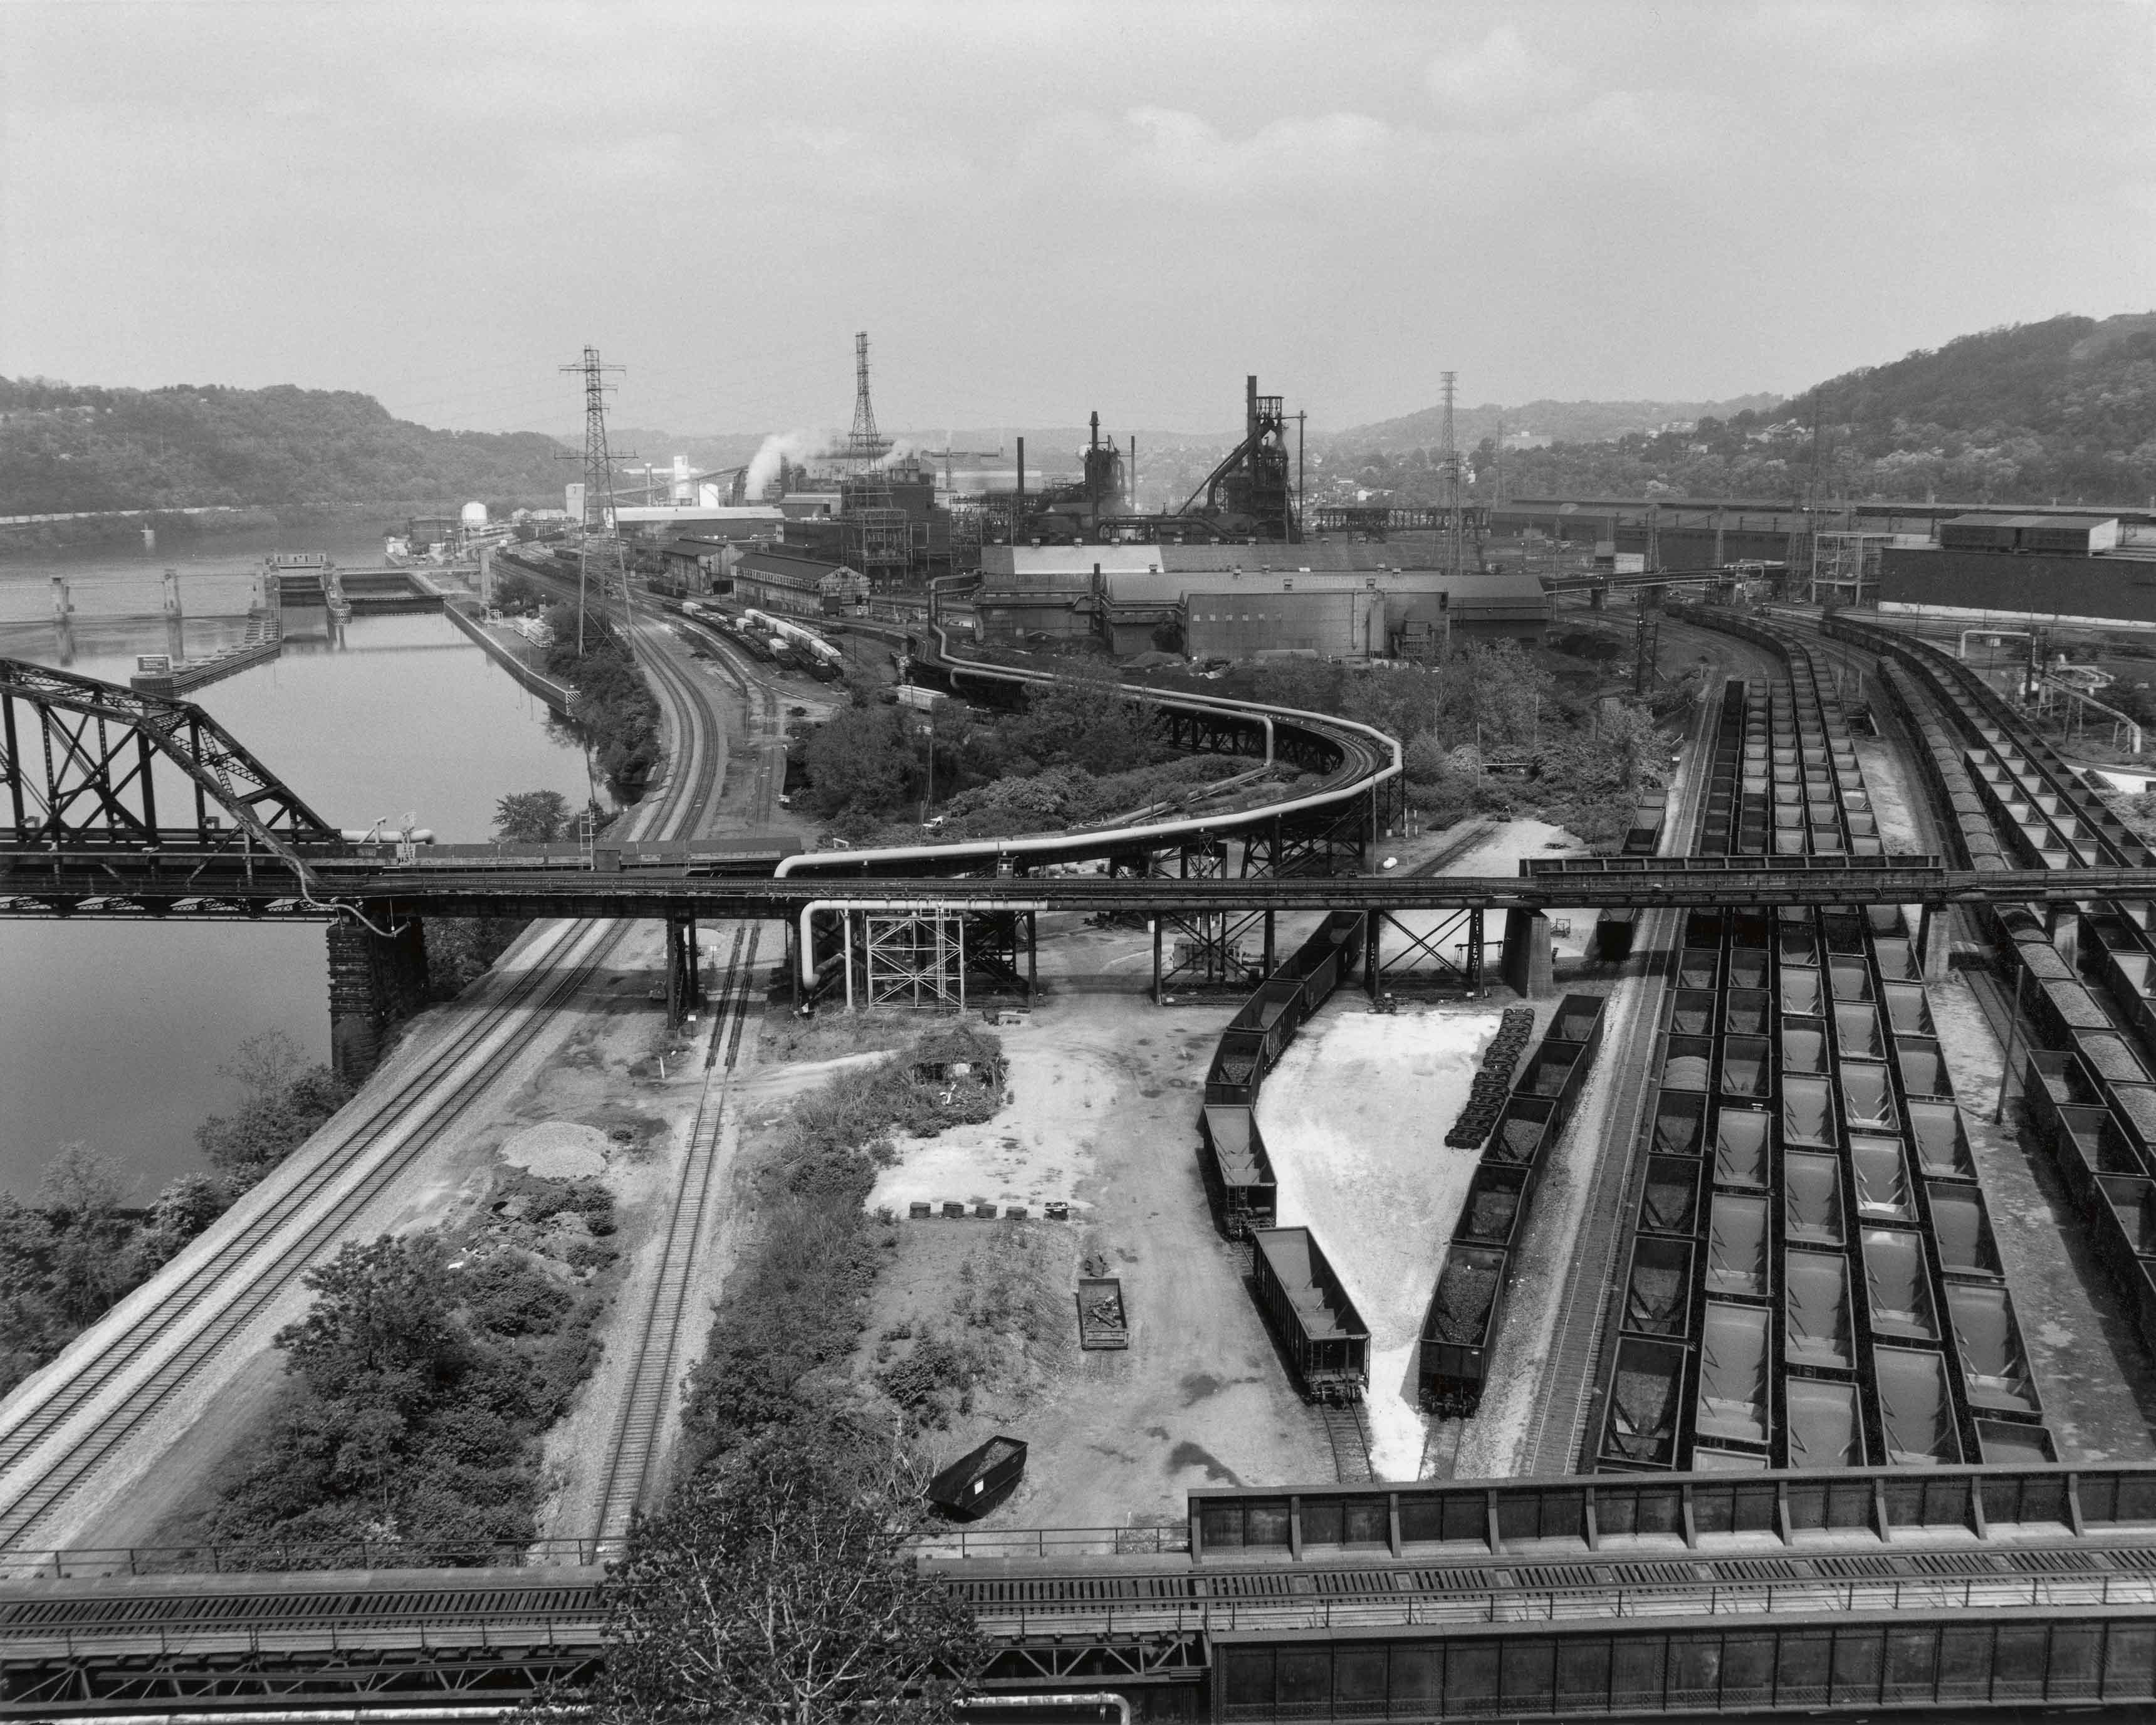 U.S.S Edgar Thompson Steel Works & MononGahela River (2013). Tirage Gélatino-Argentique, 12,9 x 152,4 cm. LaToya Ruby Frazier.